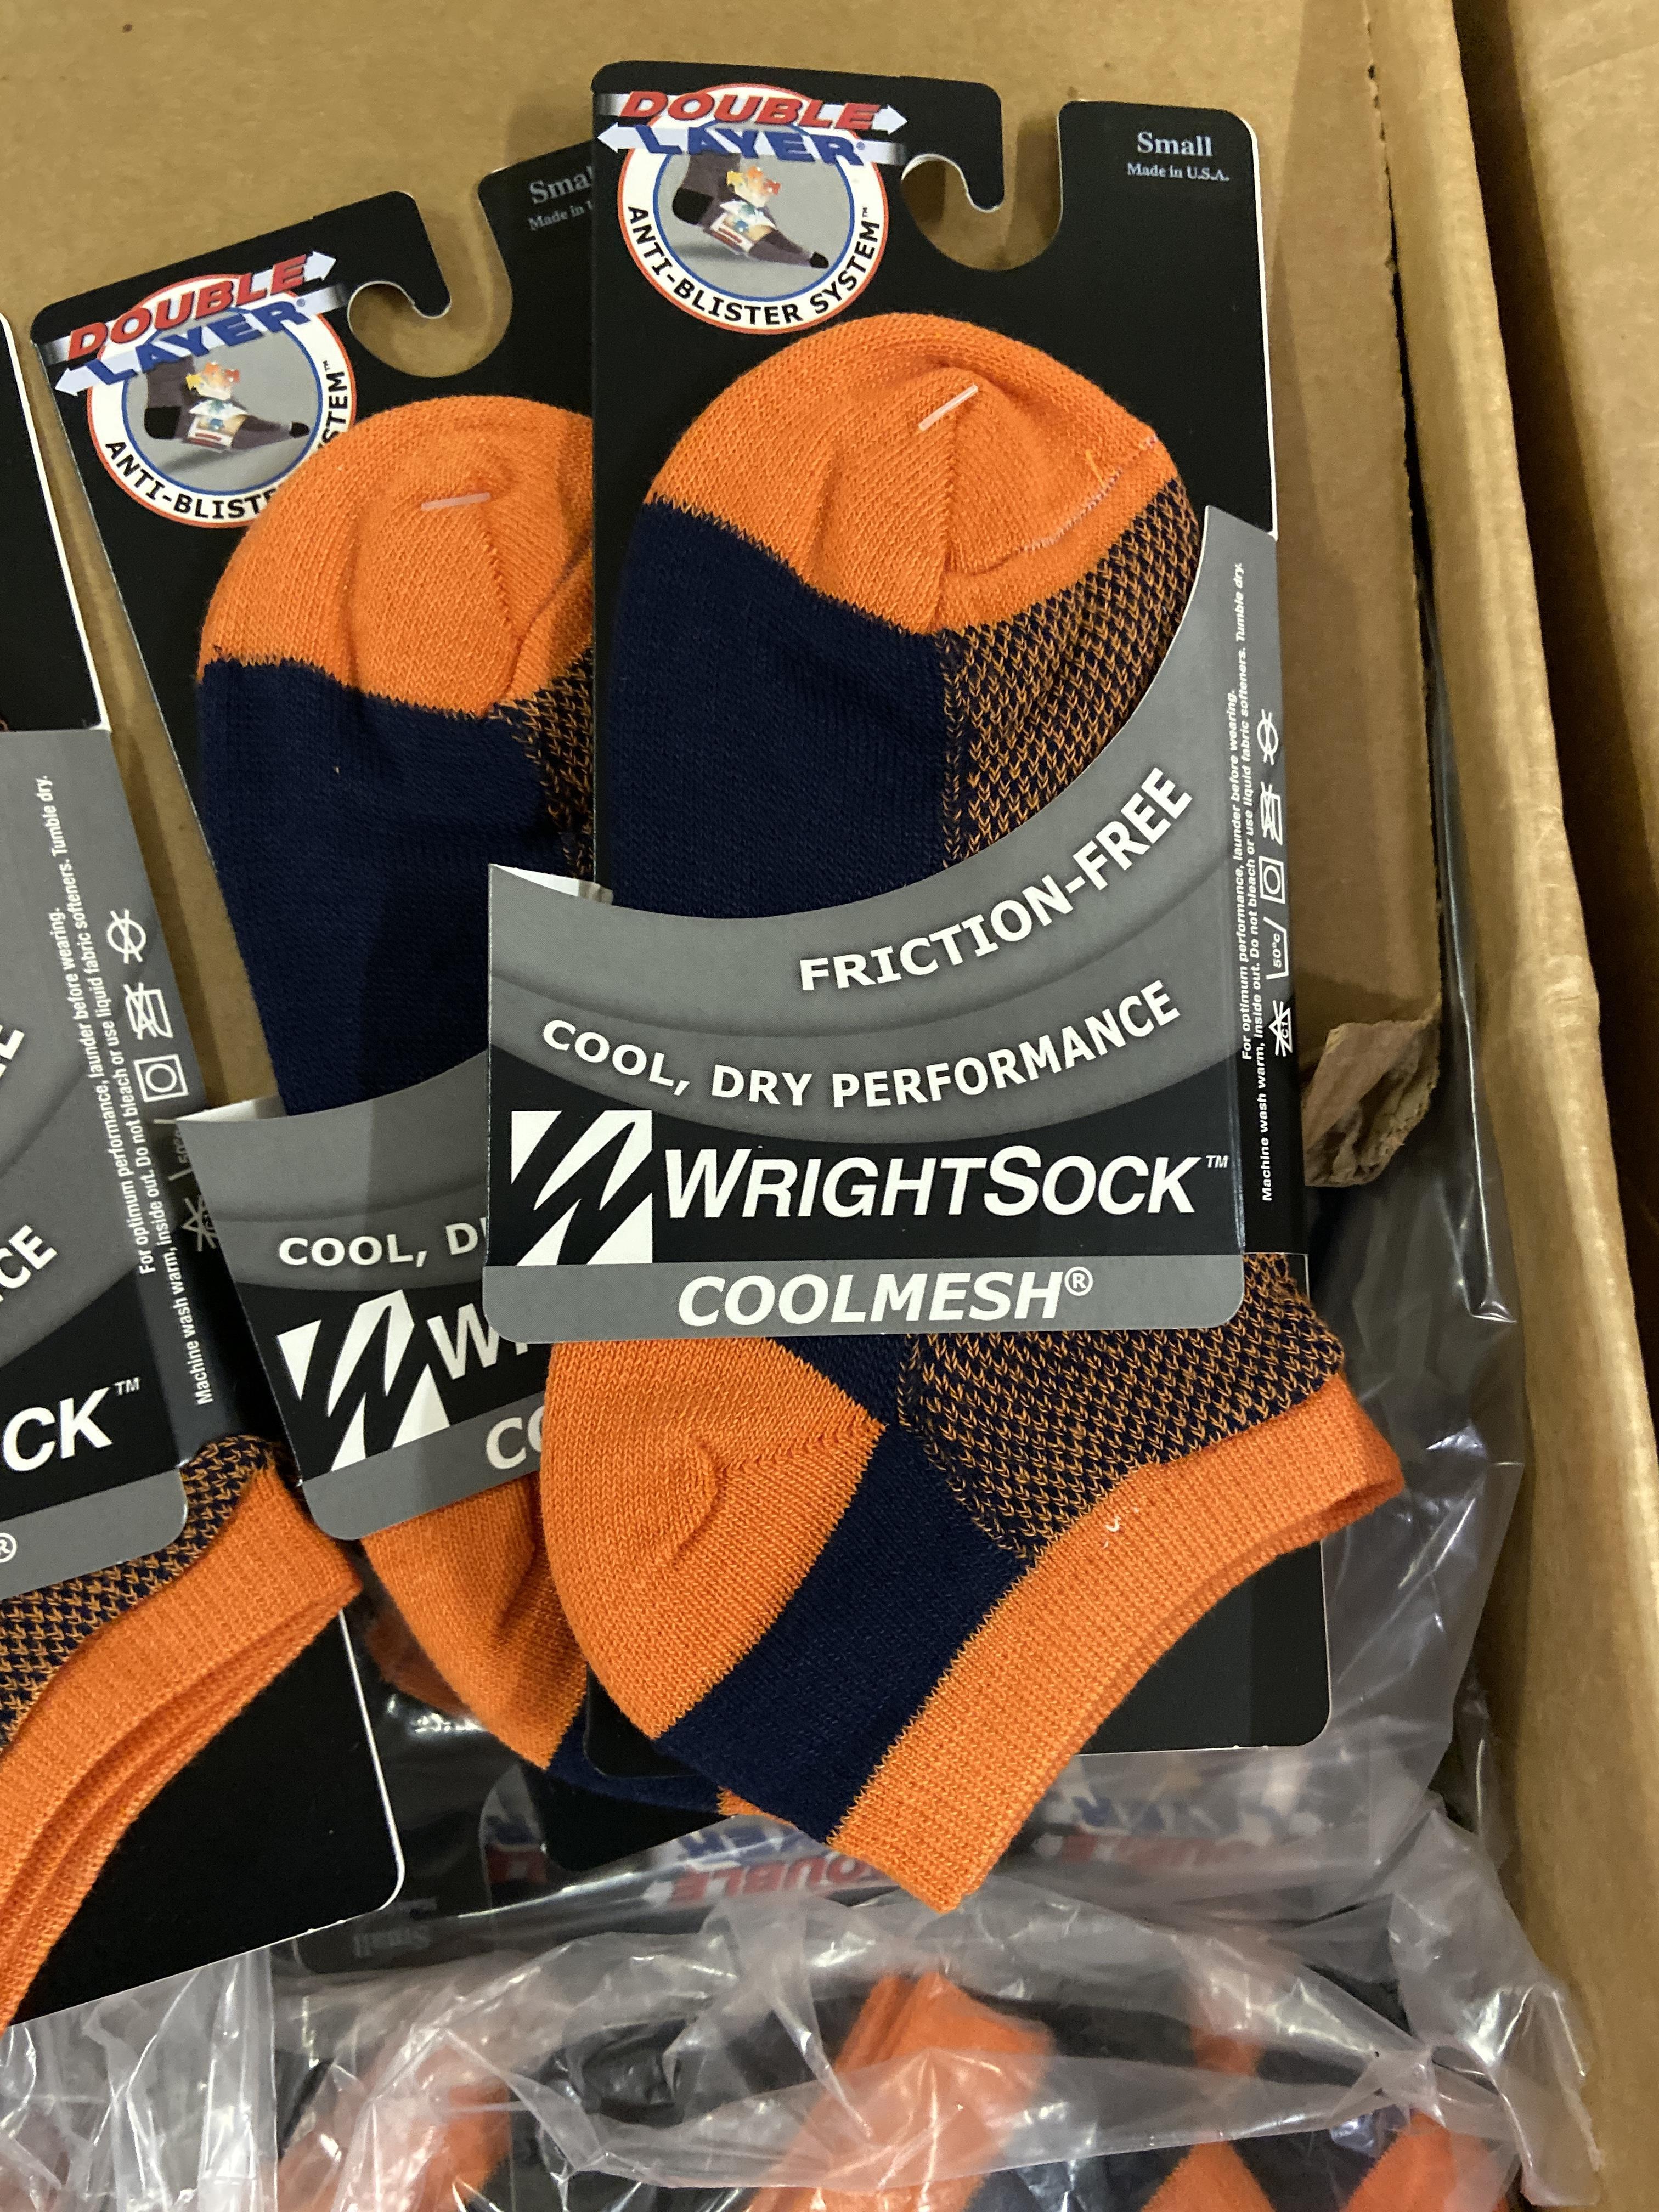 250+ packs of New Socks, Wrightsock Coolmesh, Double Layer, Orange/Black - Image 2 of 3